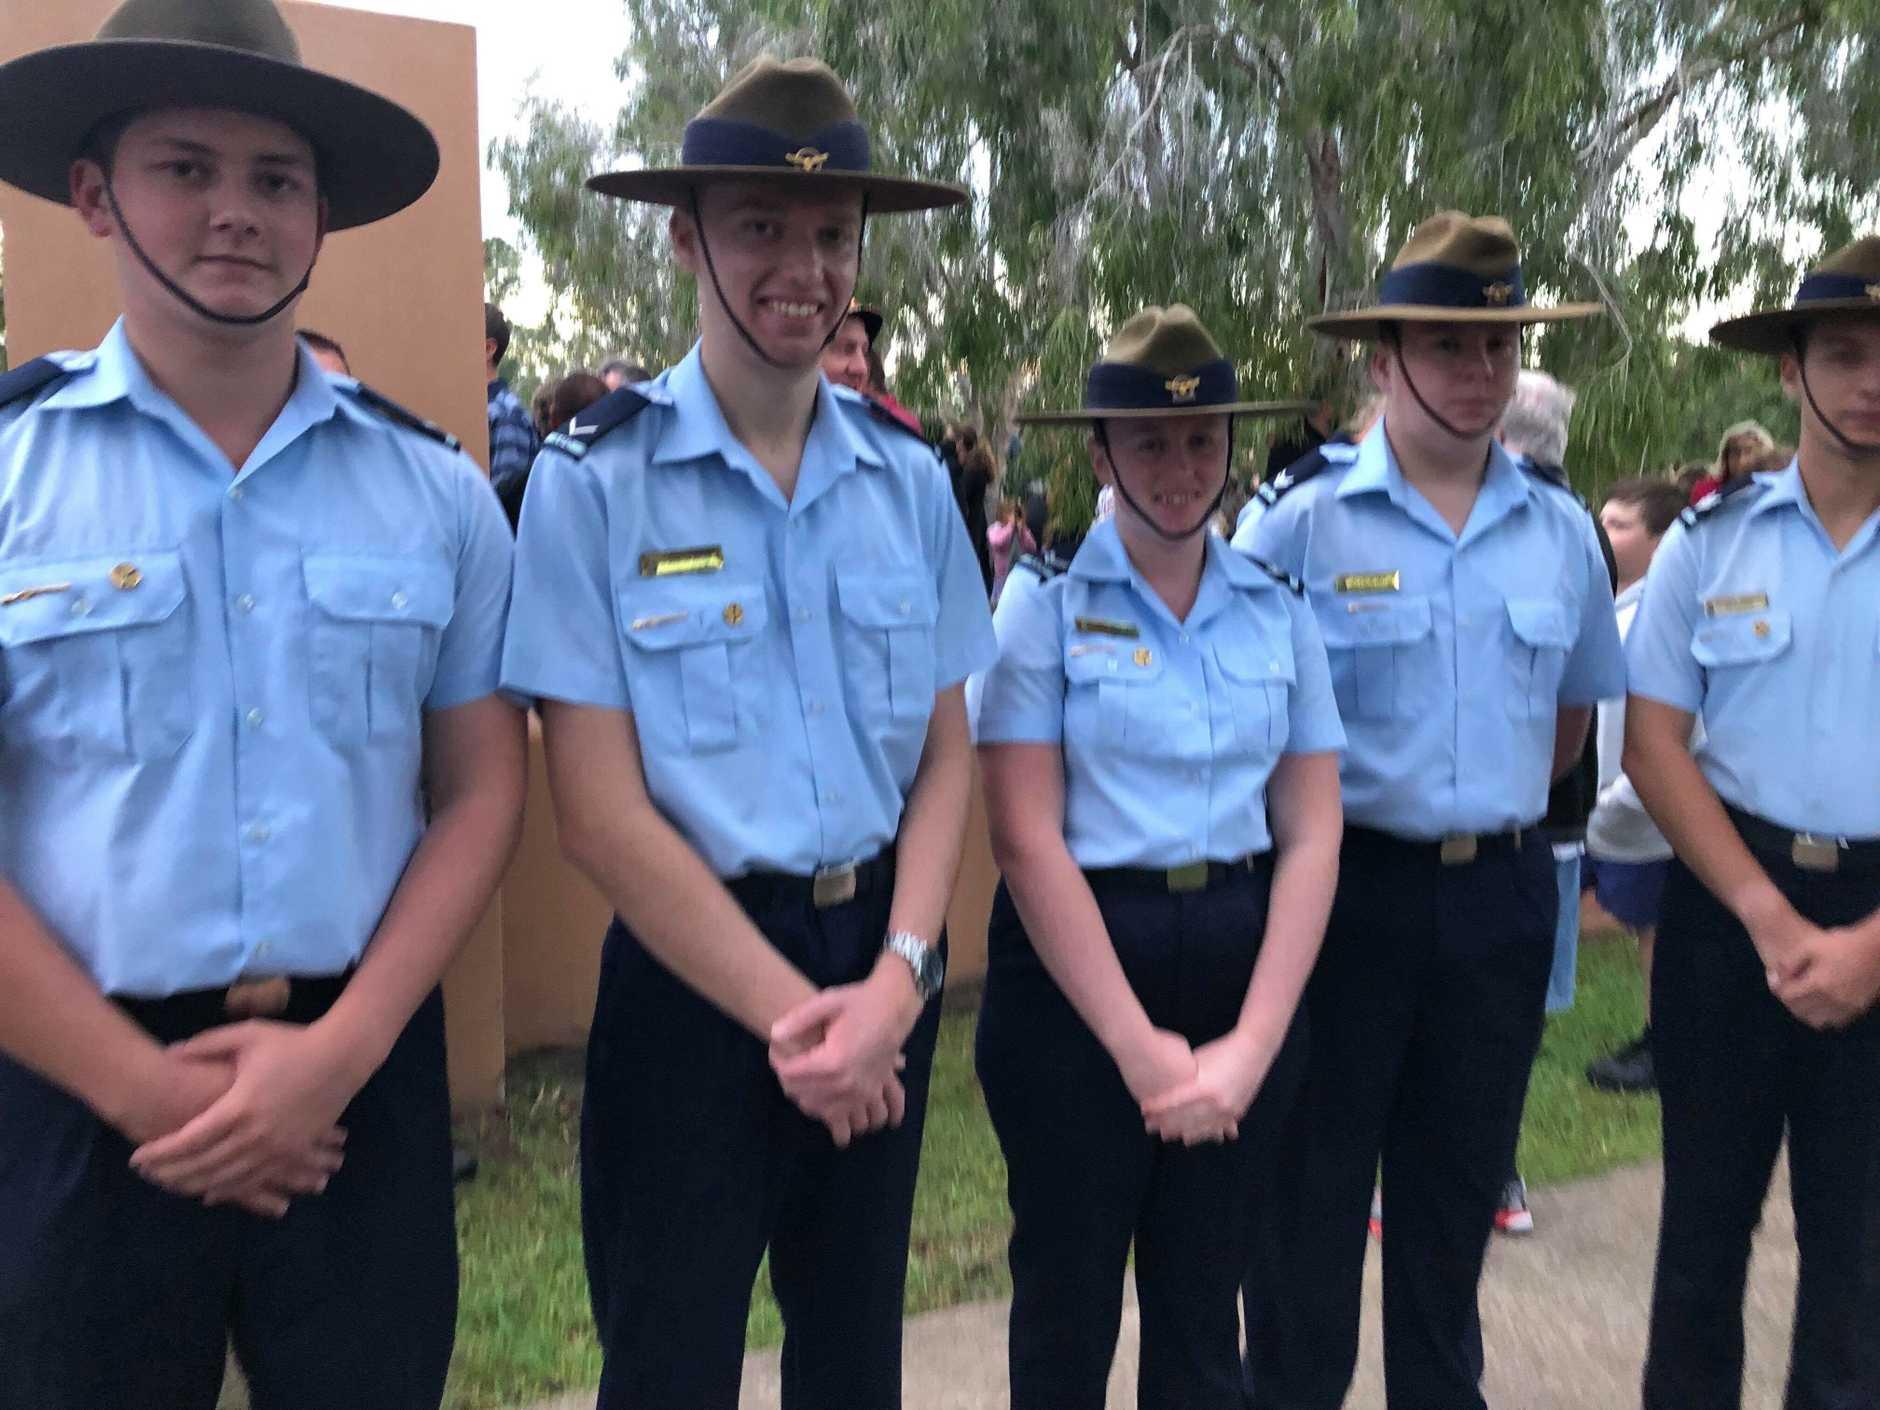 Maryborough's airforce cadets at Tinana Park on Anzac Day 2019.